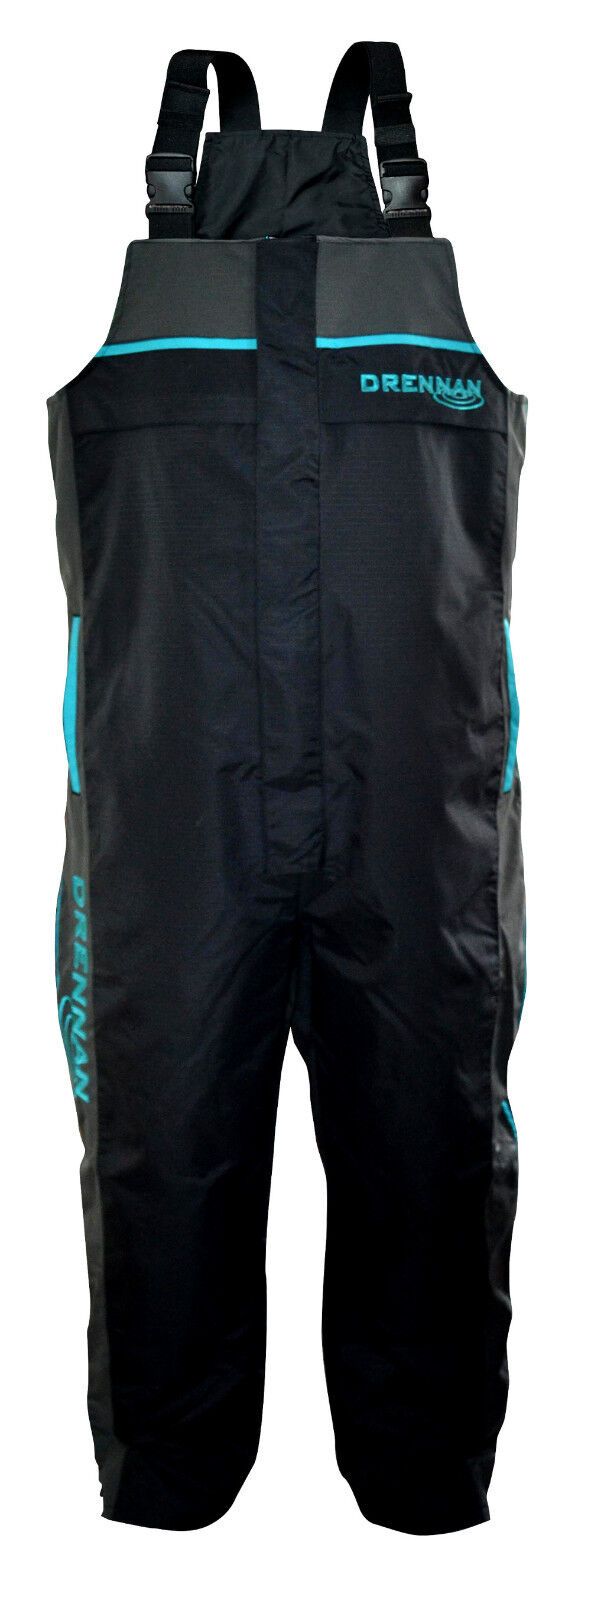 Drennan Bib & Brace impermeabile traspirante abbina pesca autopa Salopette LXXXL